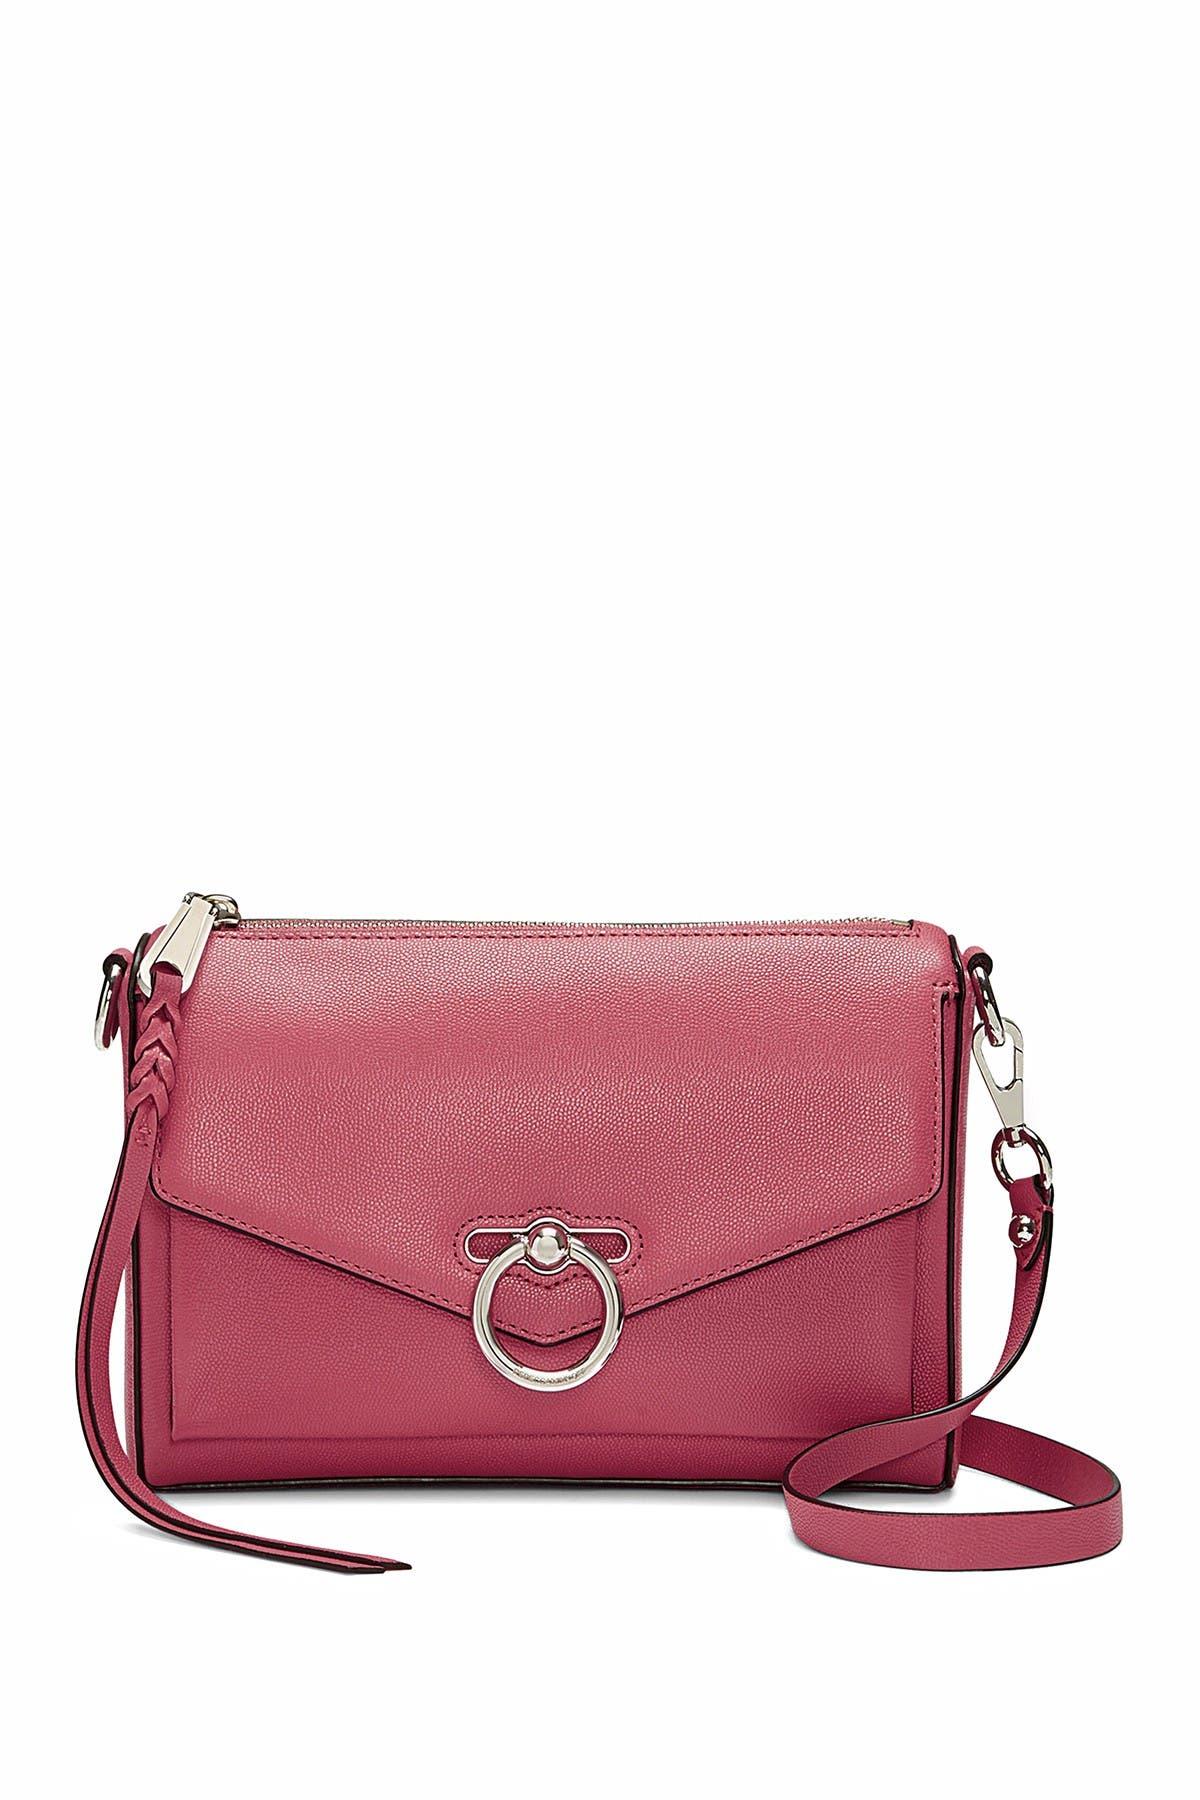 Image of Rebecca Minkoff Jean Mac Leather Crossbody Bag